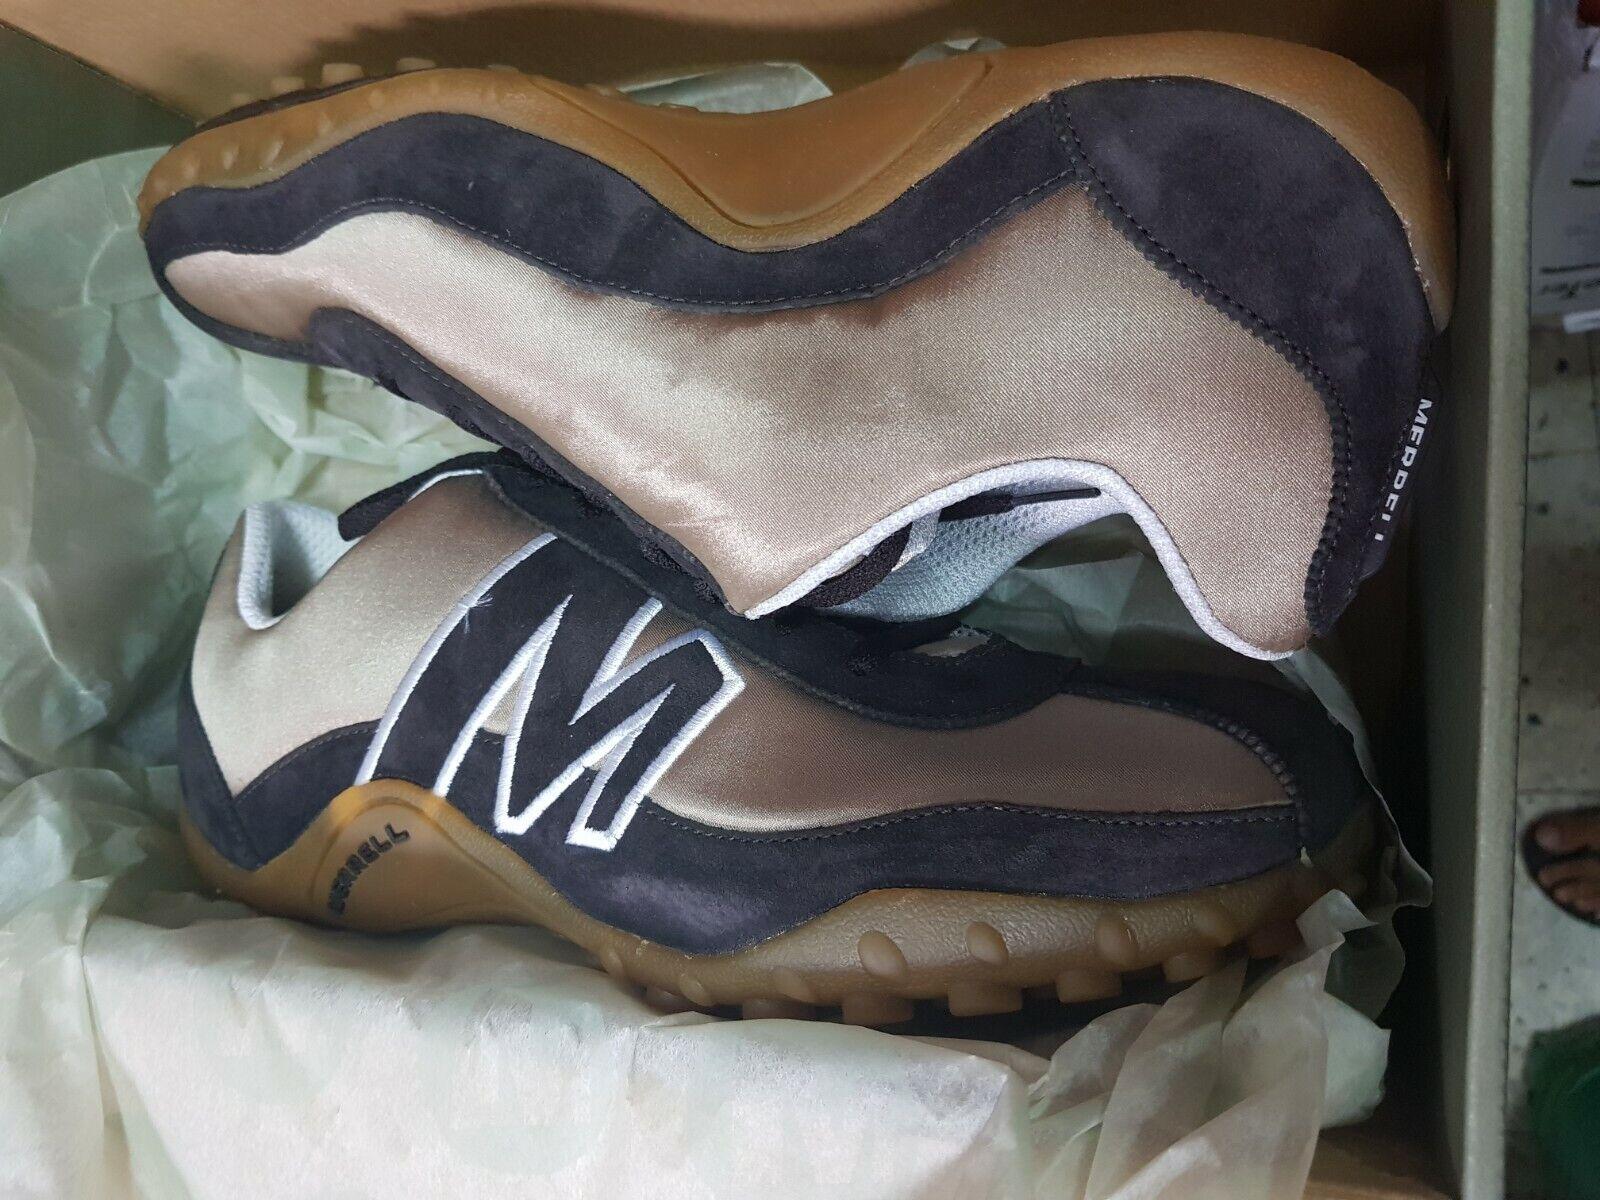 Merrell 574427 SPRINT BLAST LICORICE/WHITE Mens Casual Fashion Shoes UK Sz 10.5